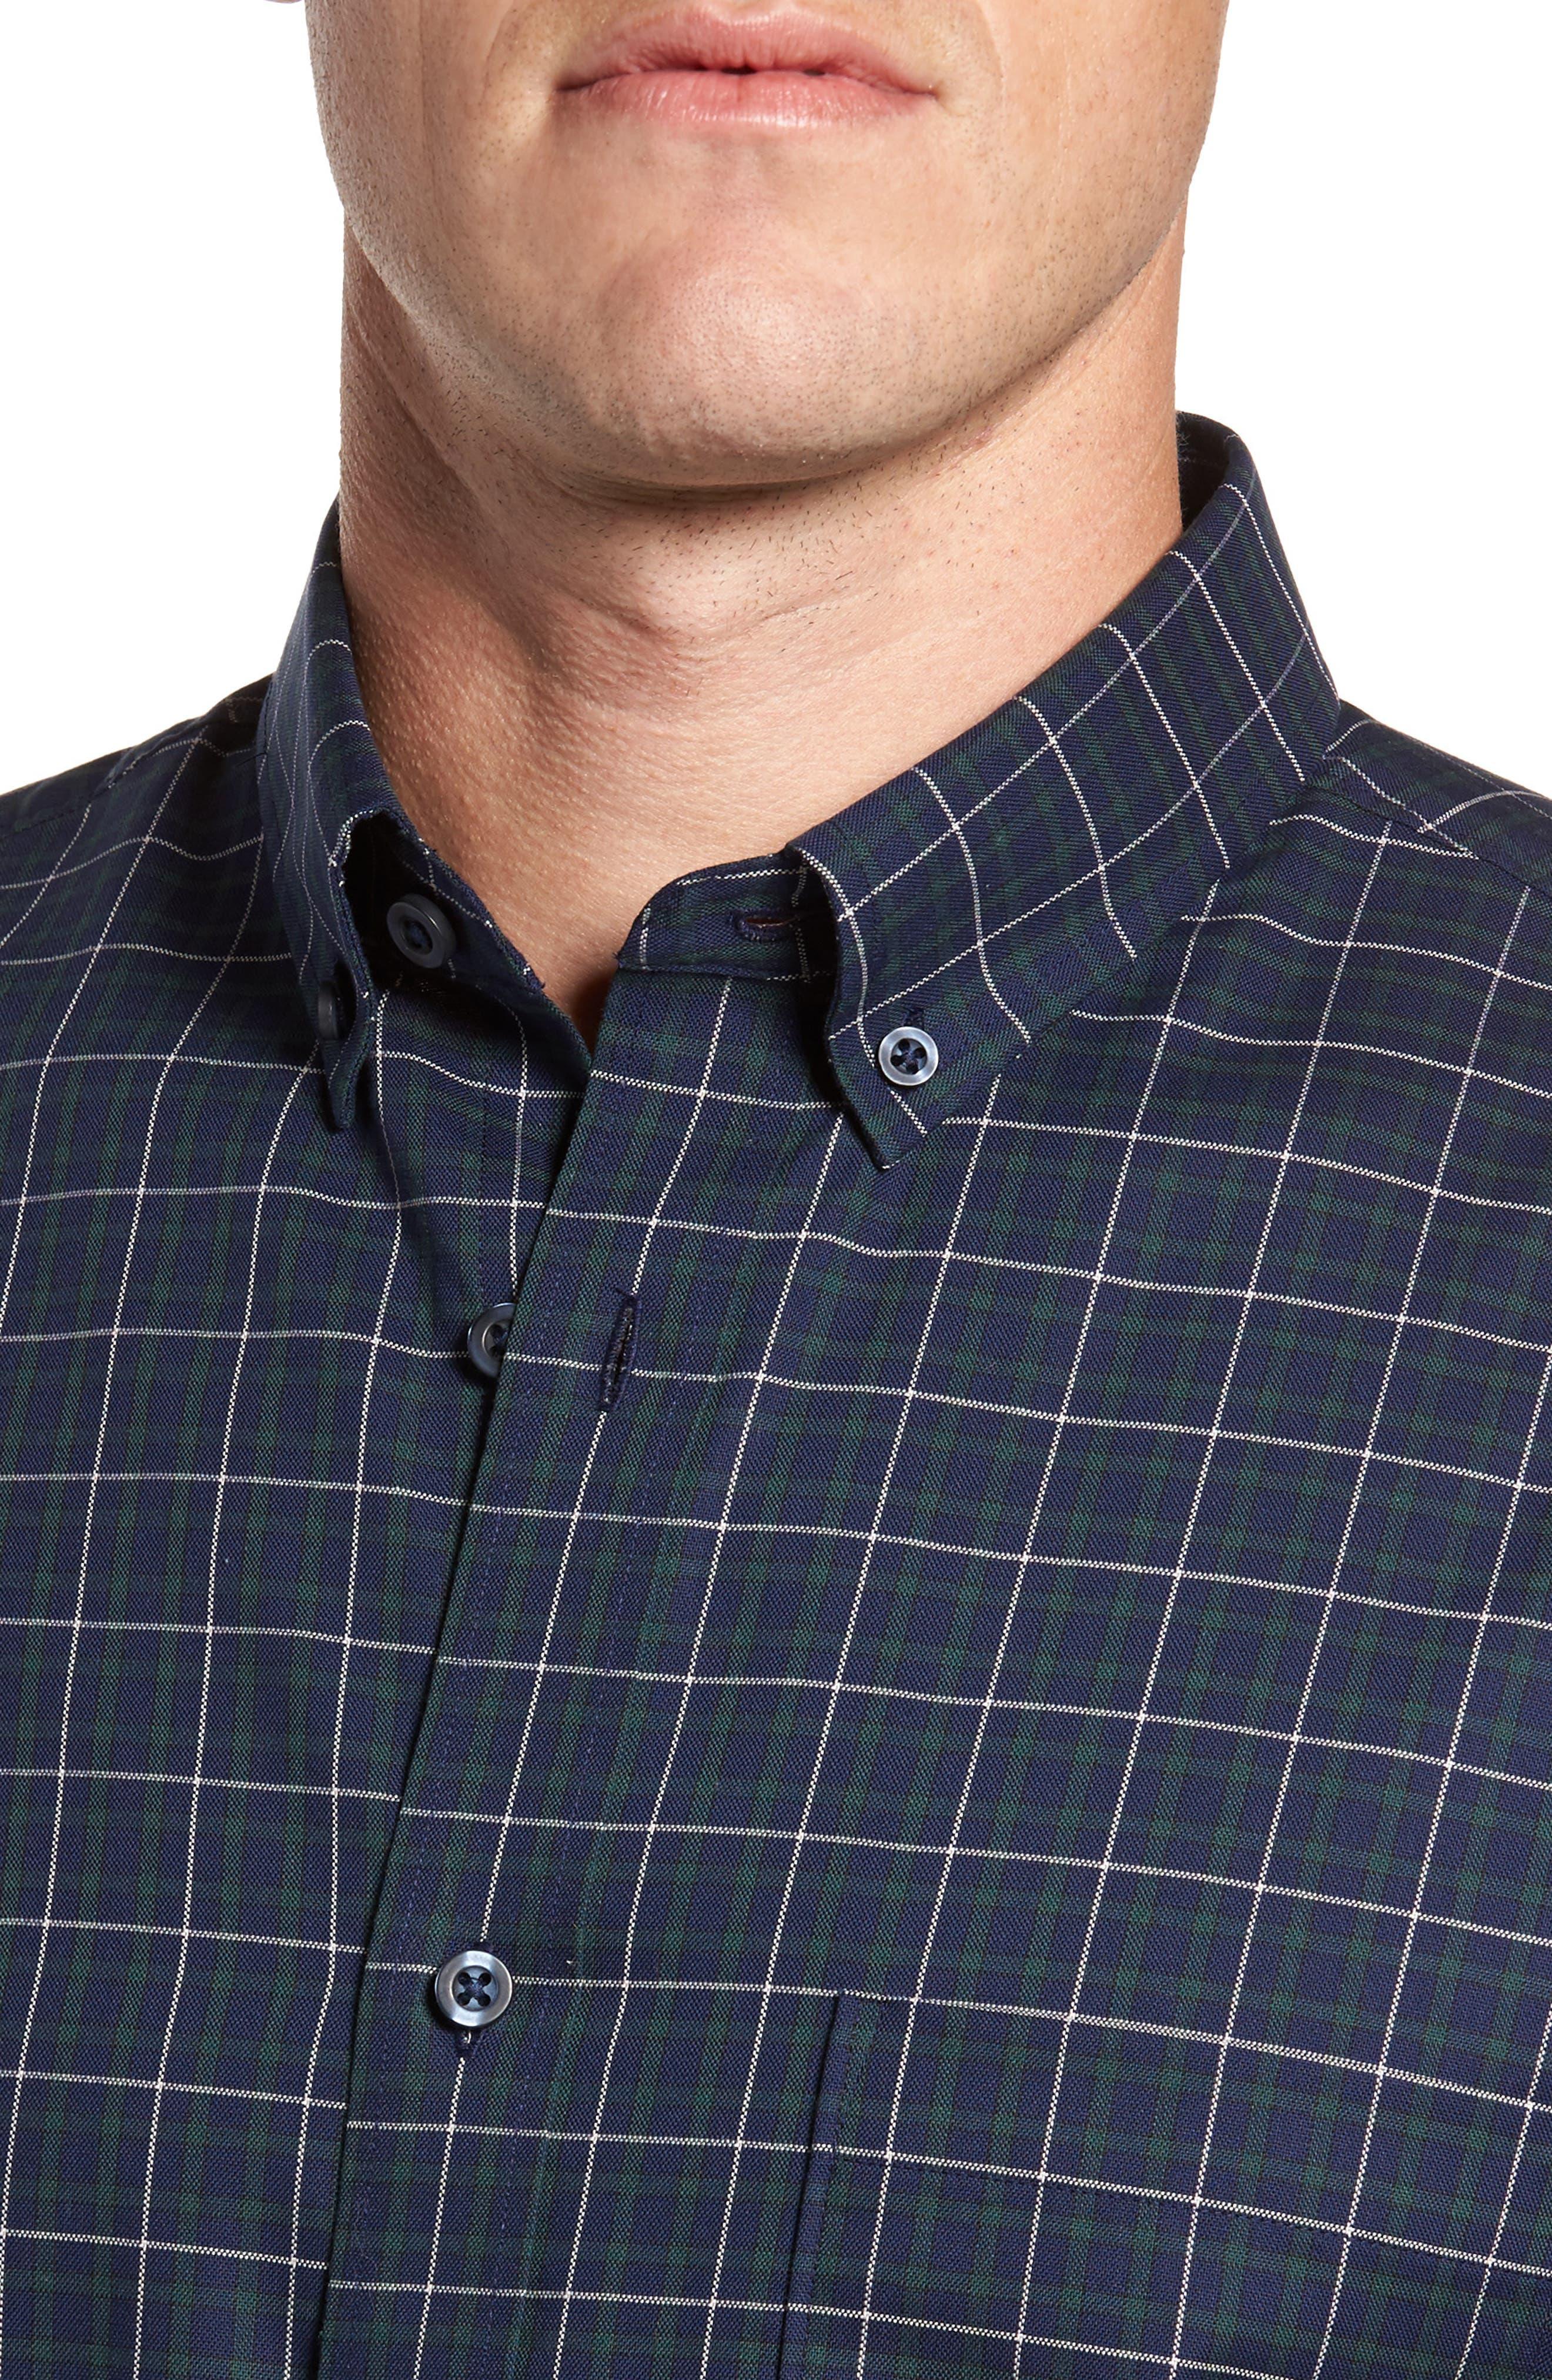 Regular Fit Non-Iron Plaid Sport Shirt,                             Alternate thumbnail 4, color,